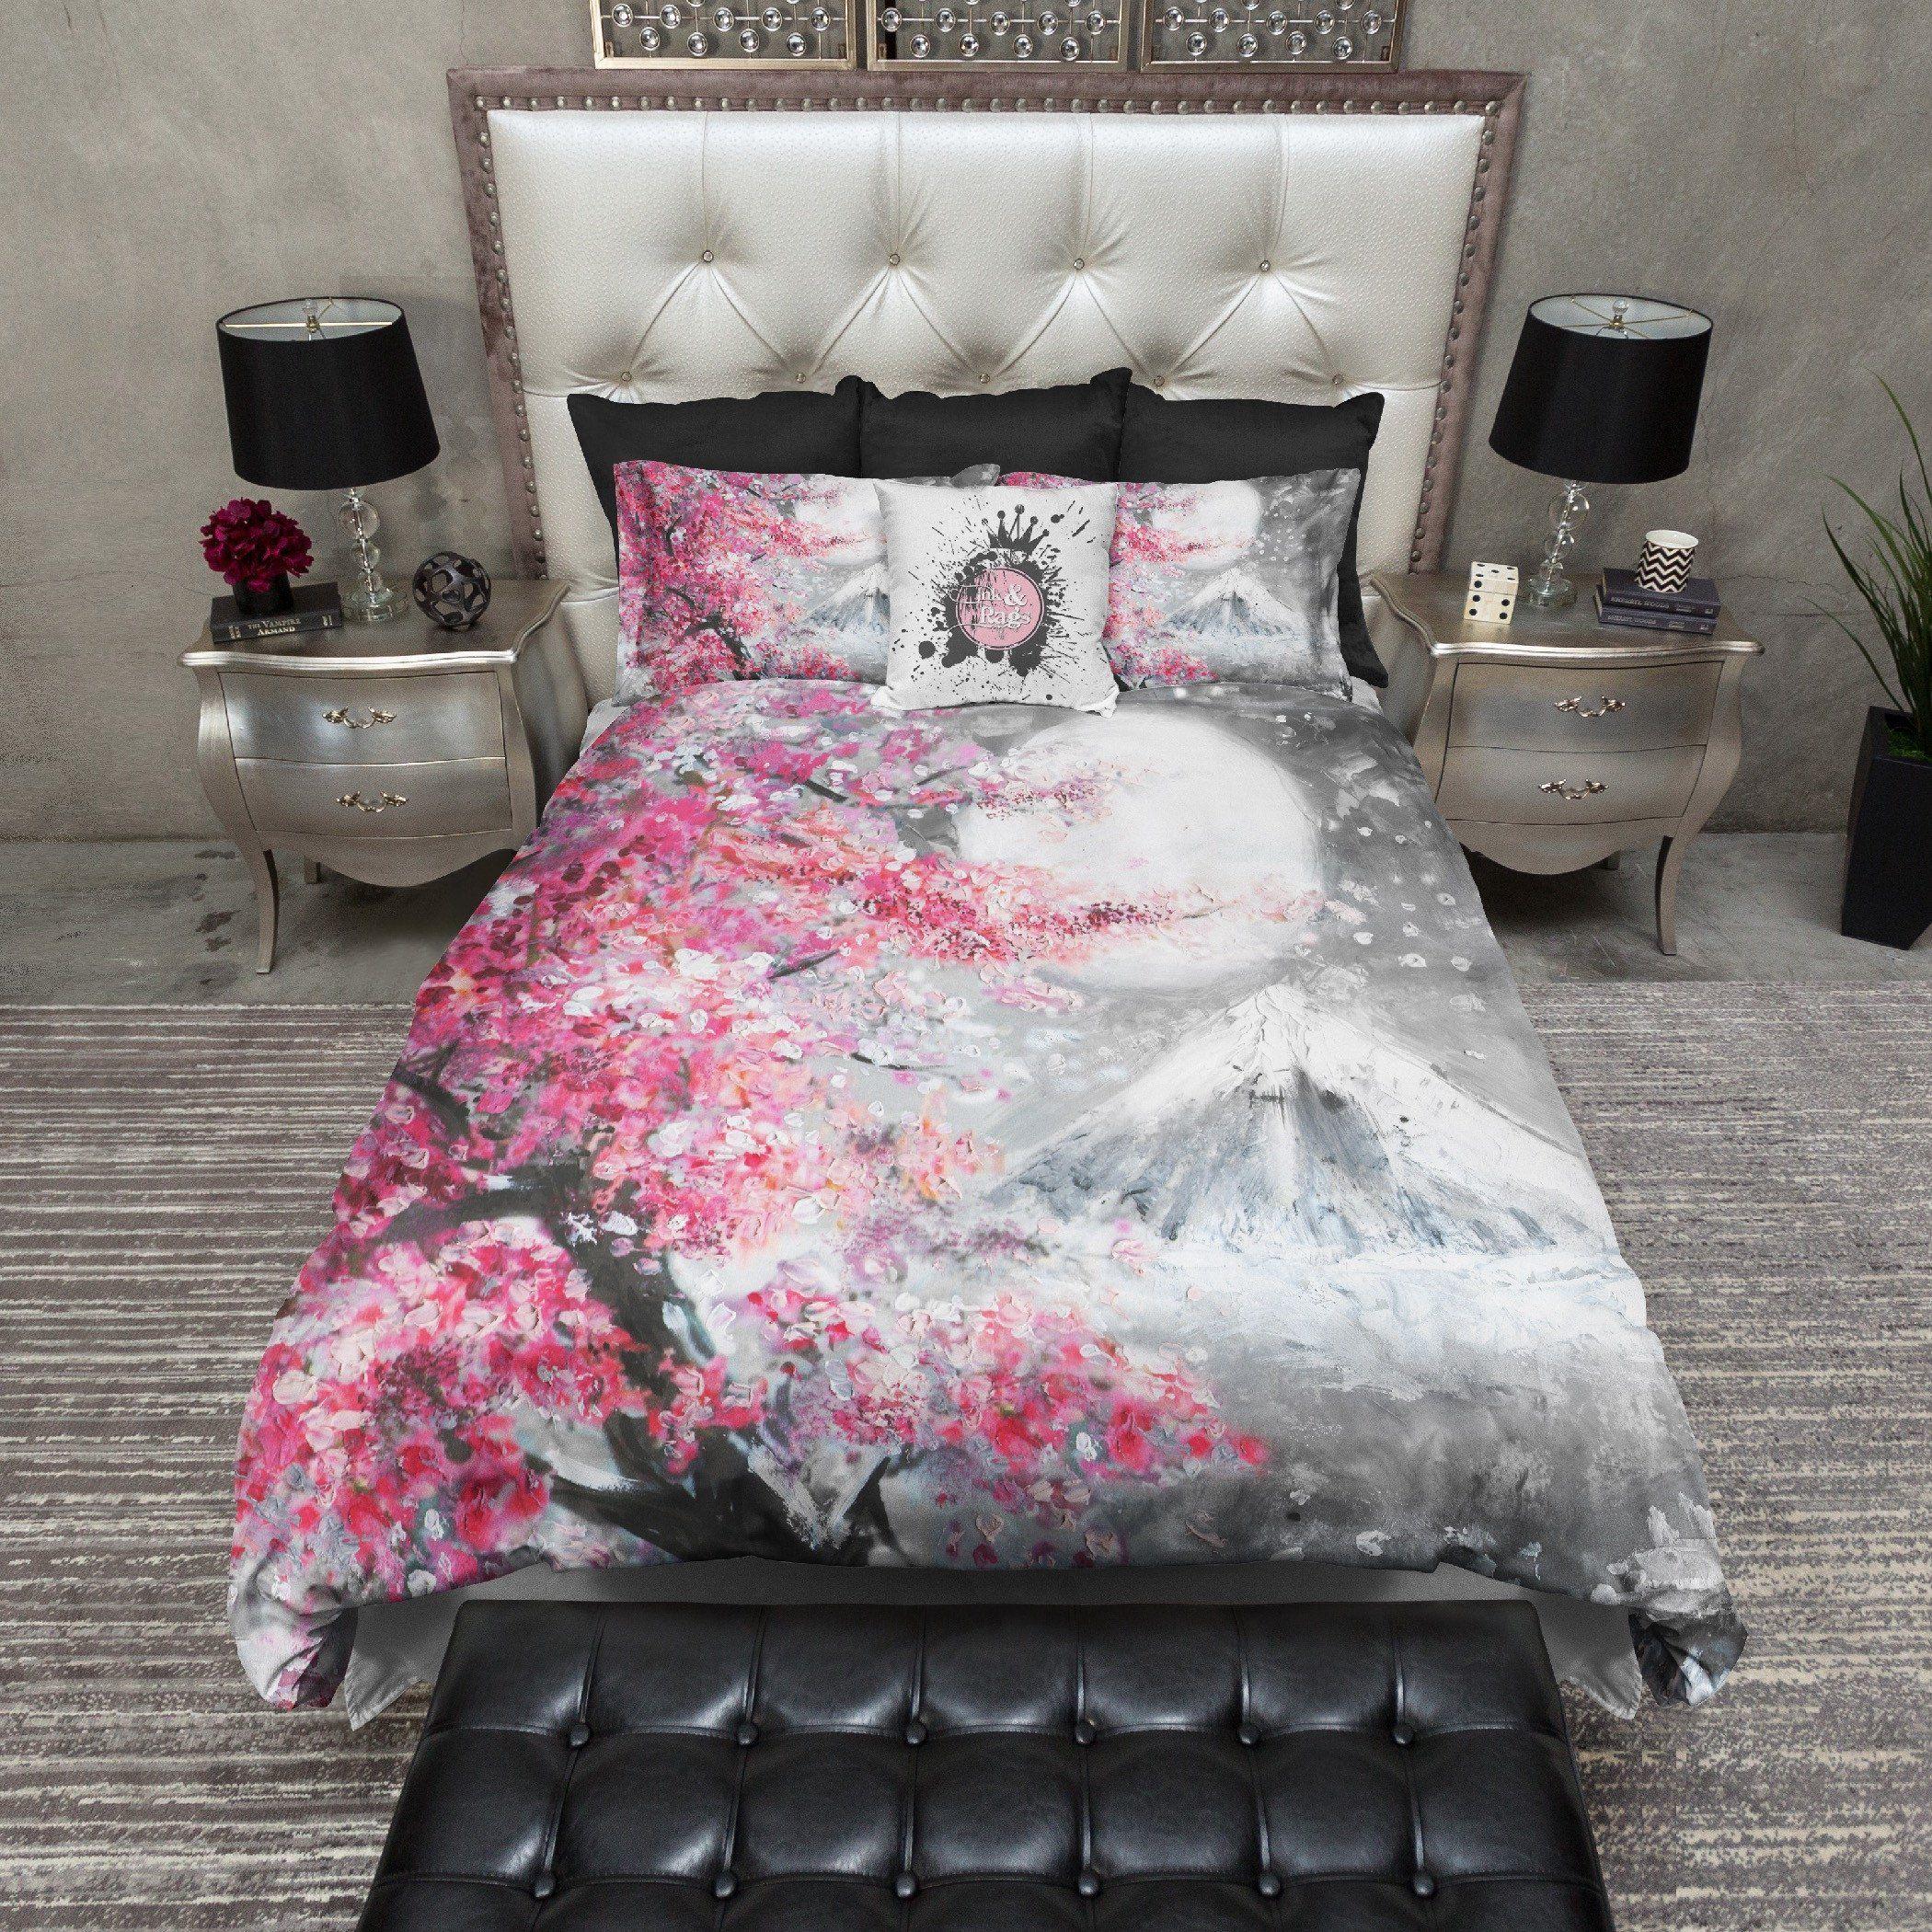 Red Cherry Blossom Bedding